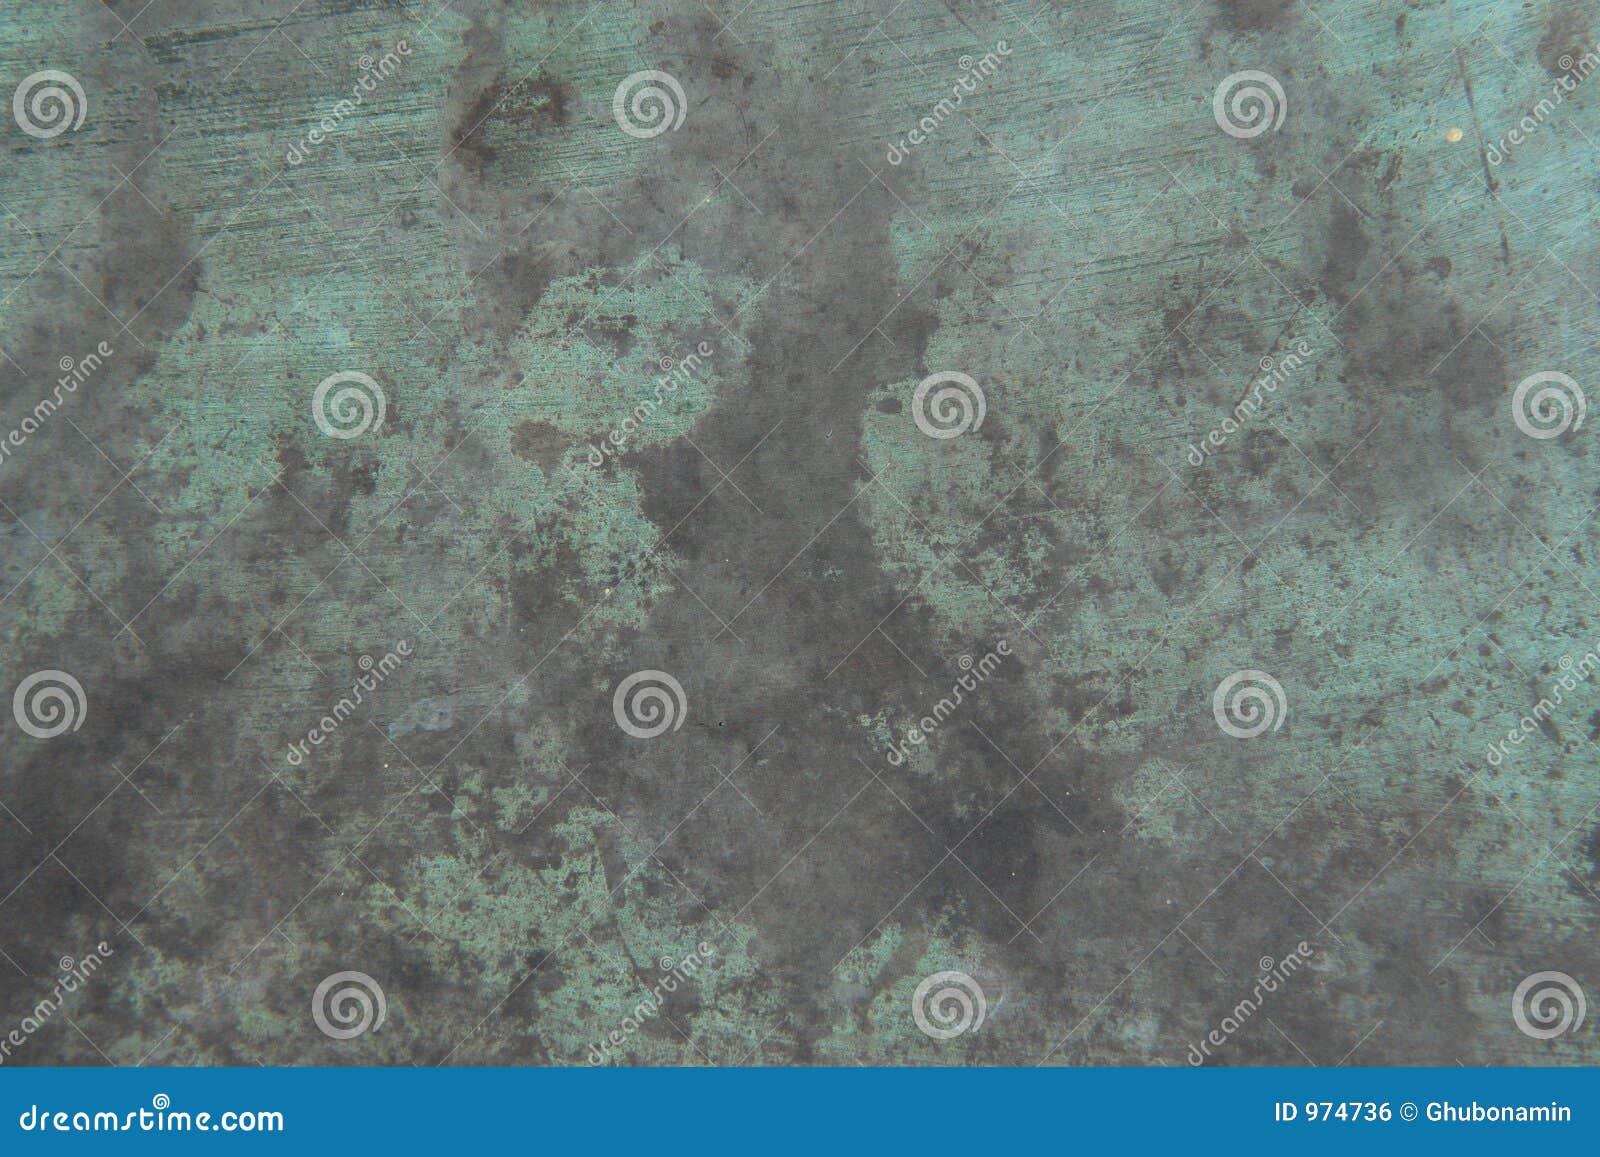 metal oxidized royalty free stock image